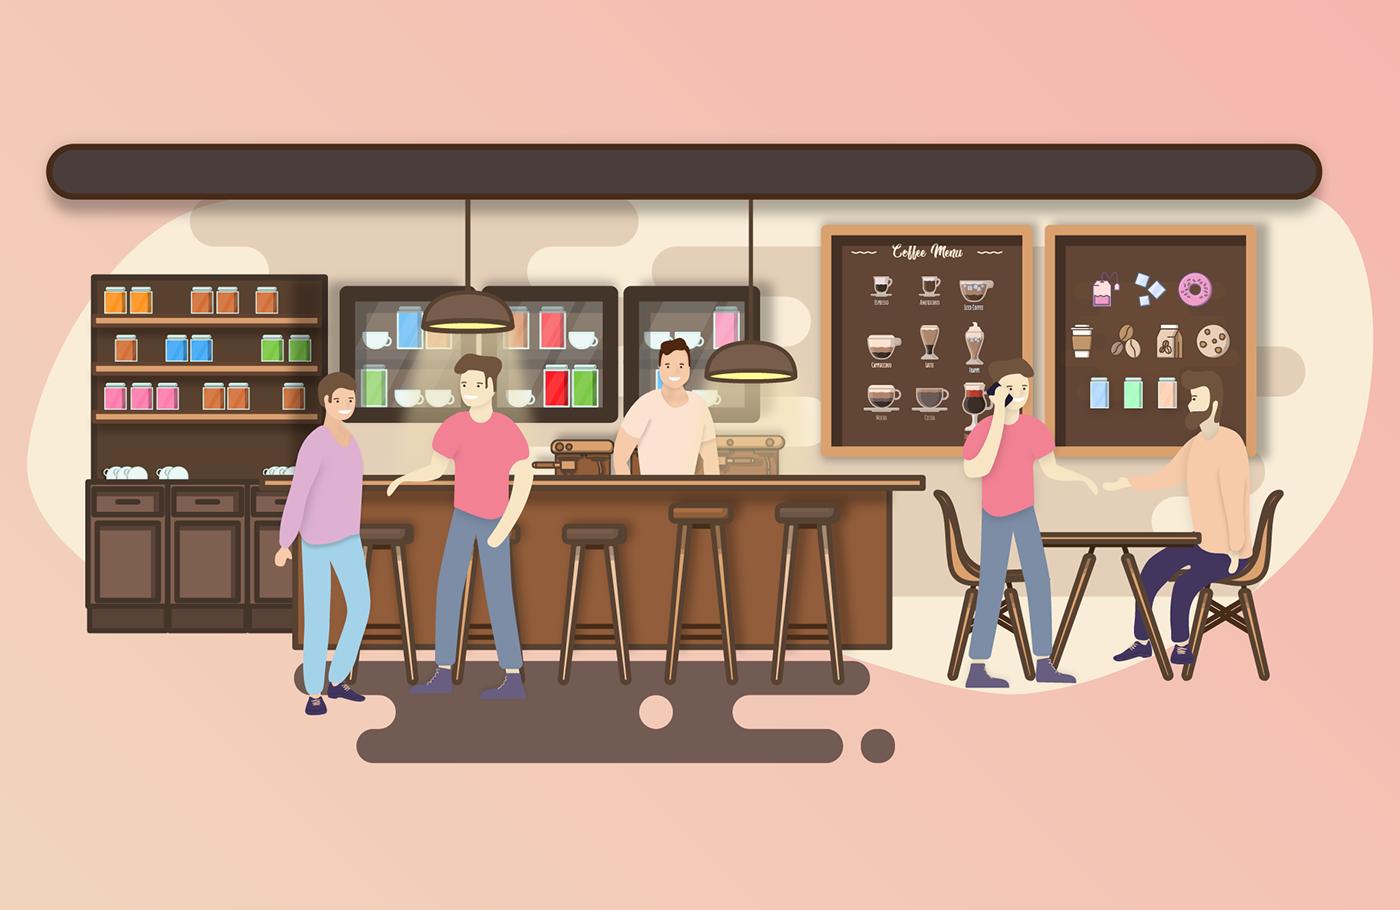 Coffee espresso Icon set cafe sweet caffeine shop